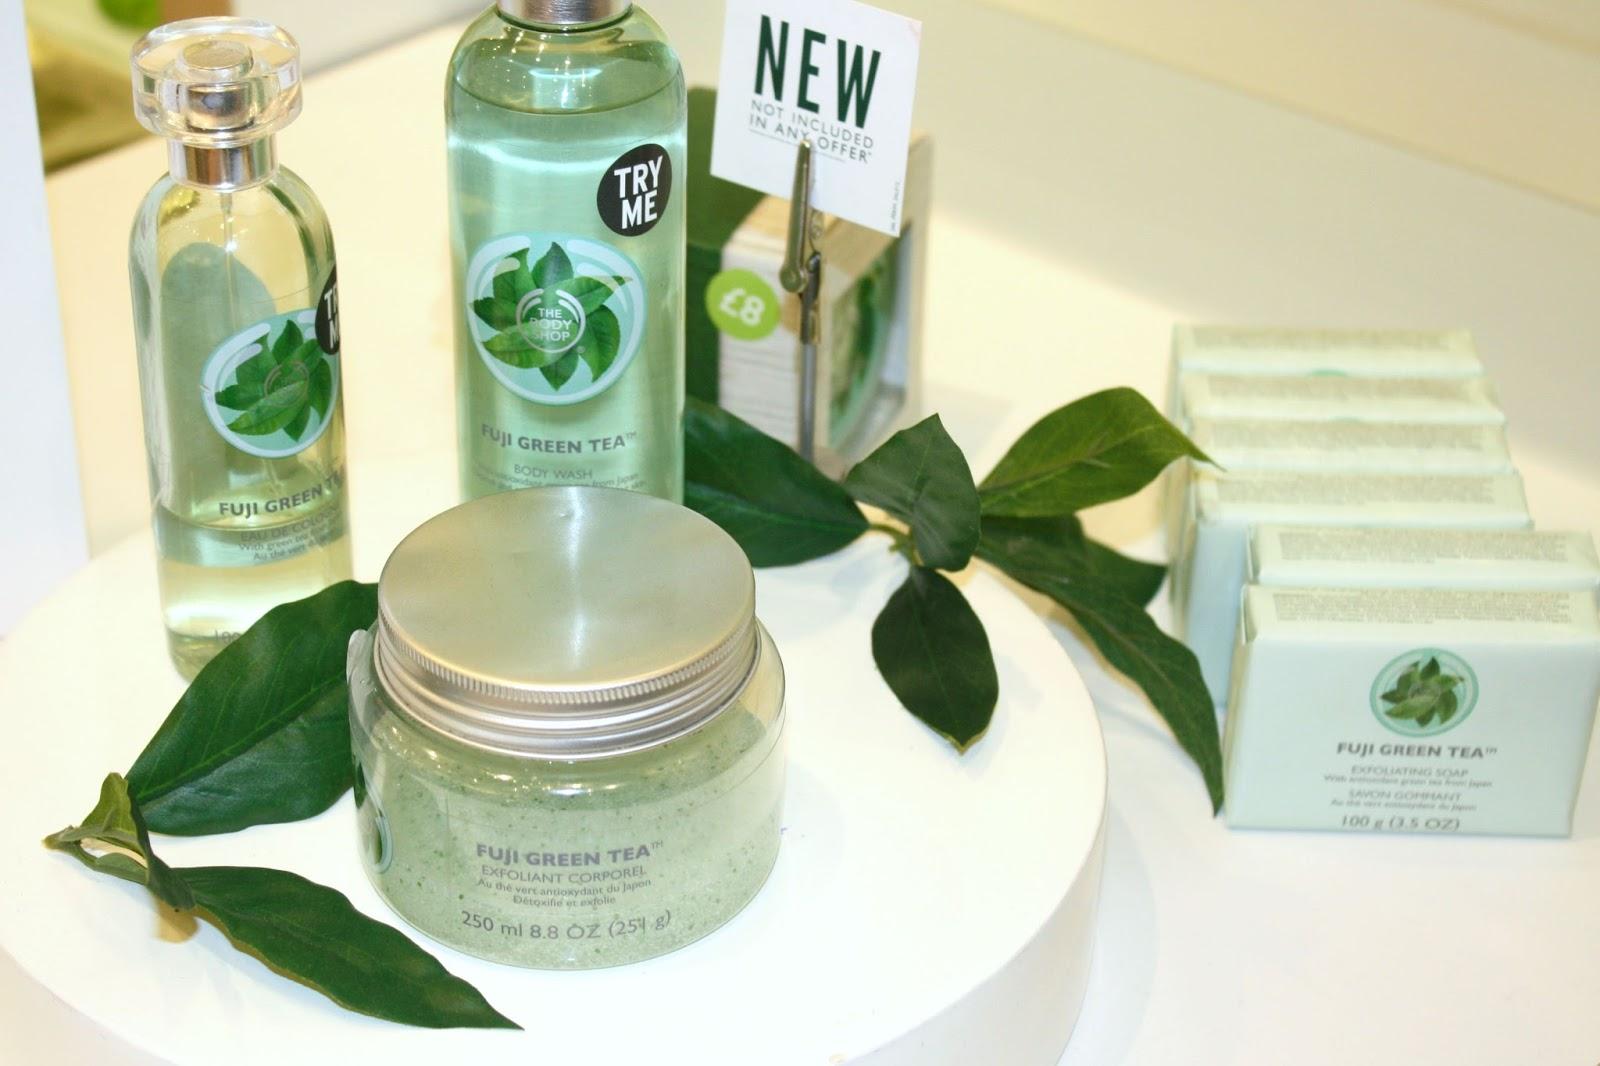 The Body Shop Southampton Spa Of The World Event Fuji Green Tea Range